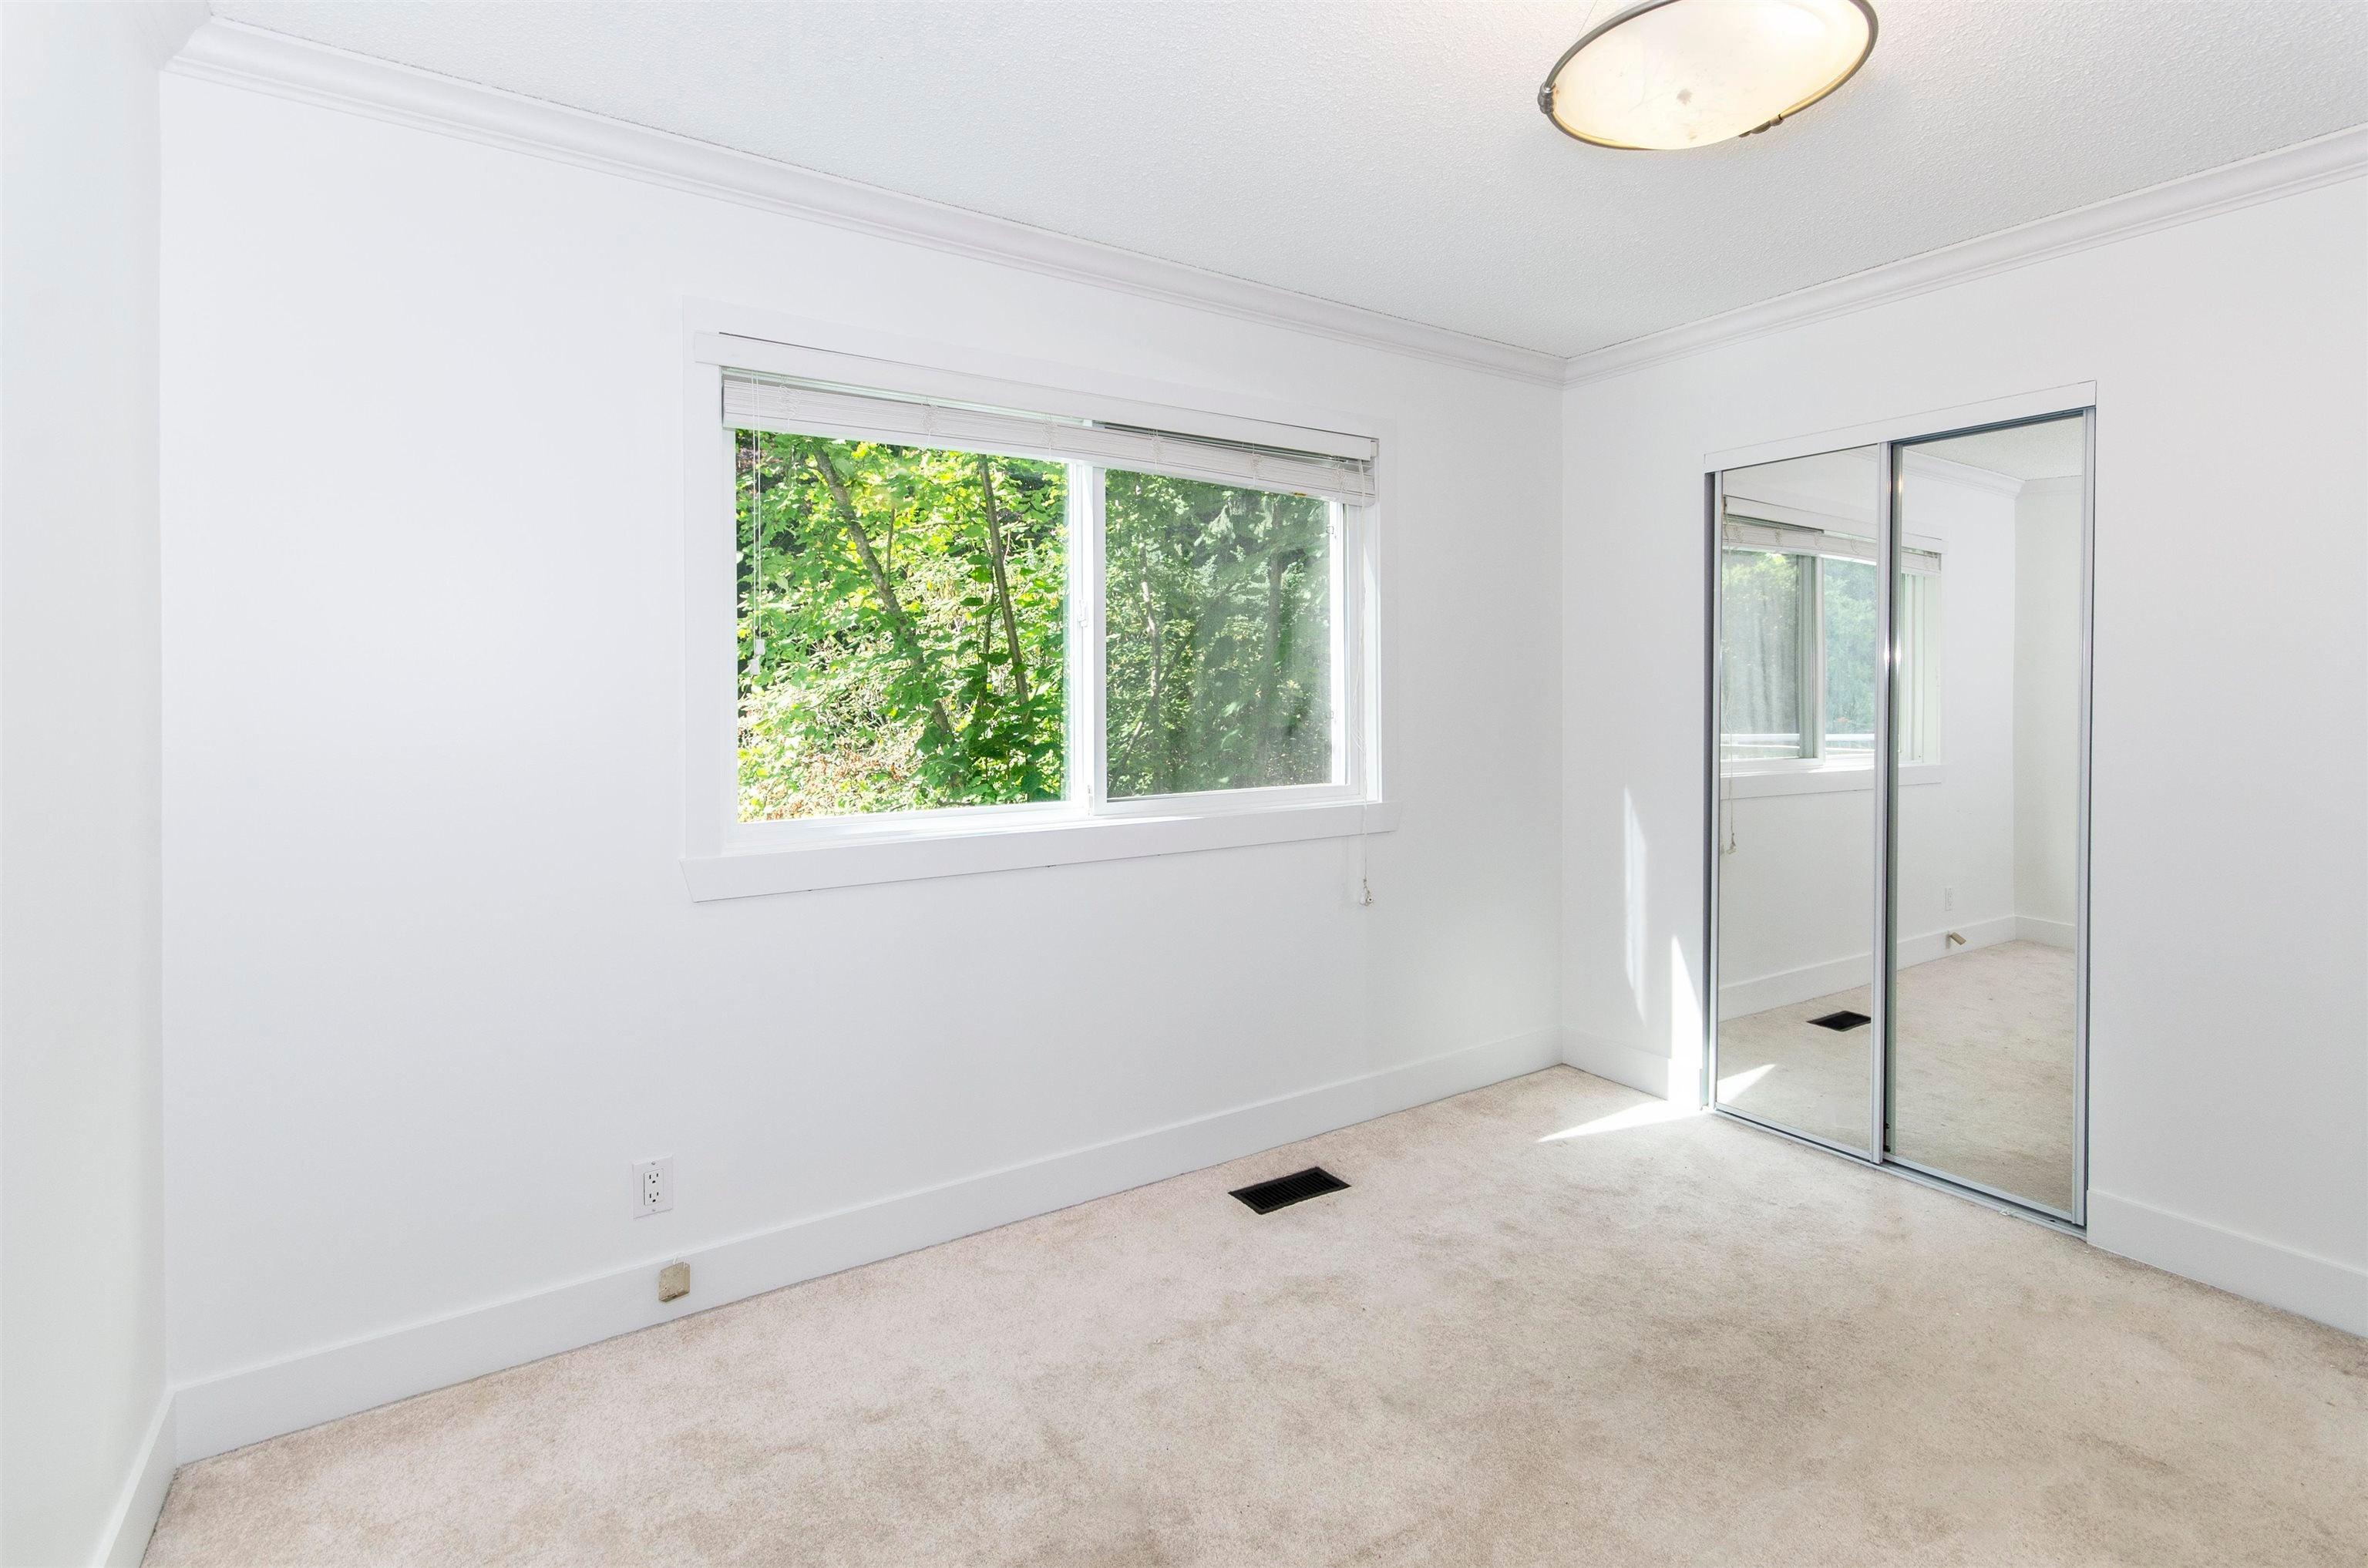 3785 REGENT AVENUE - Upper Lonsdale House/Single Family for sale, 4 Bedrooms (R2617648) - #14